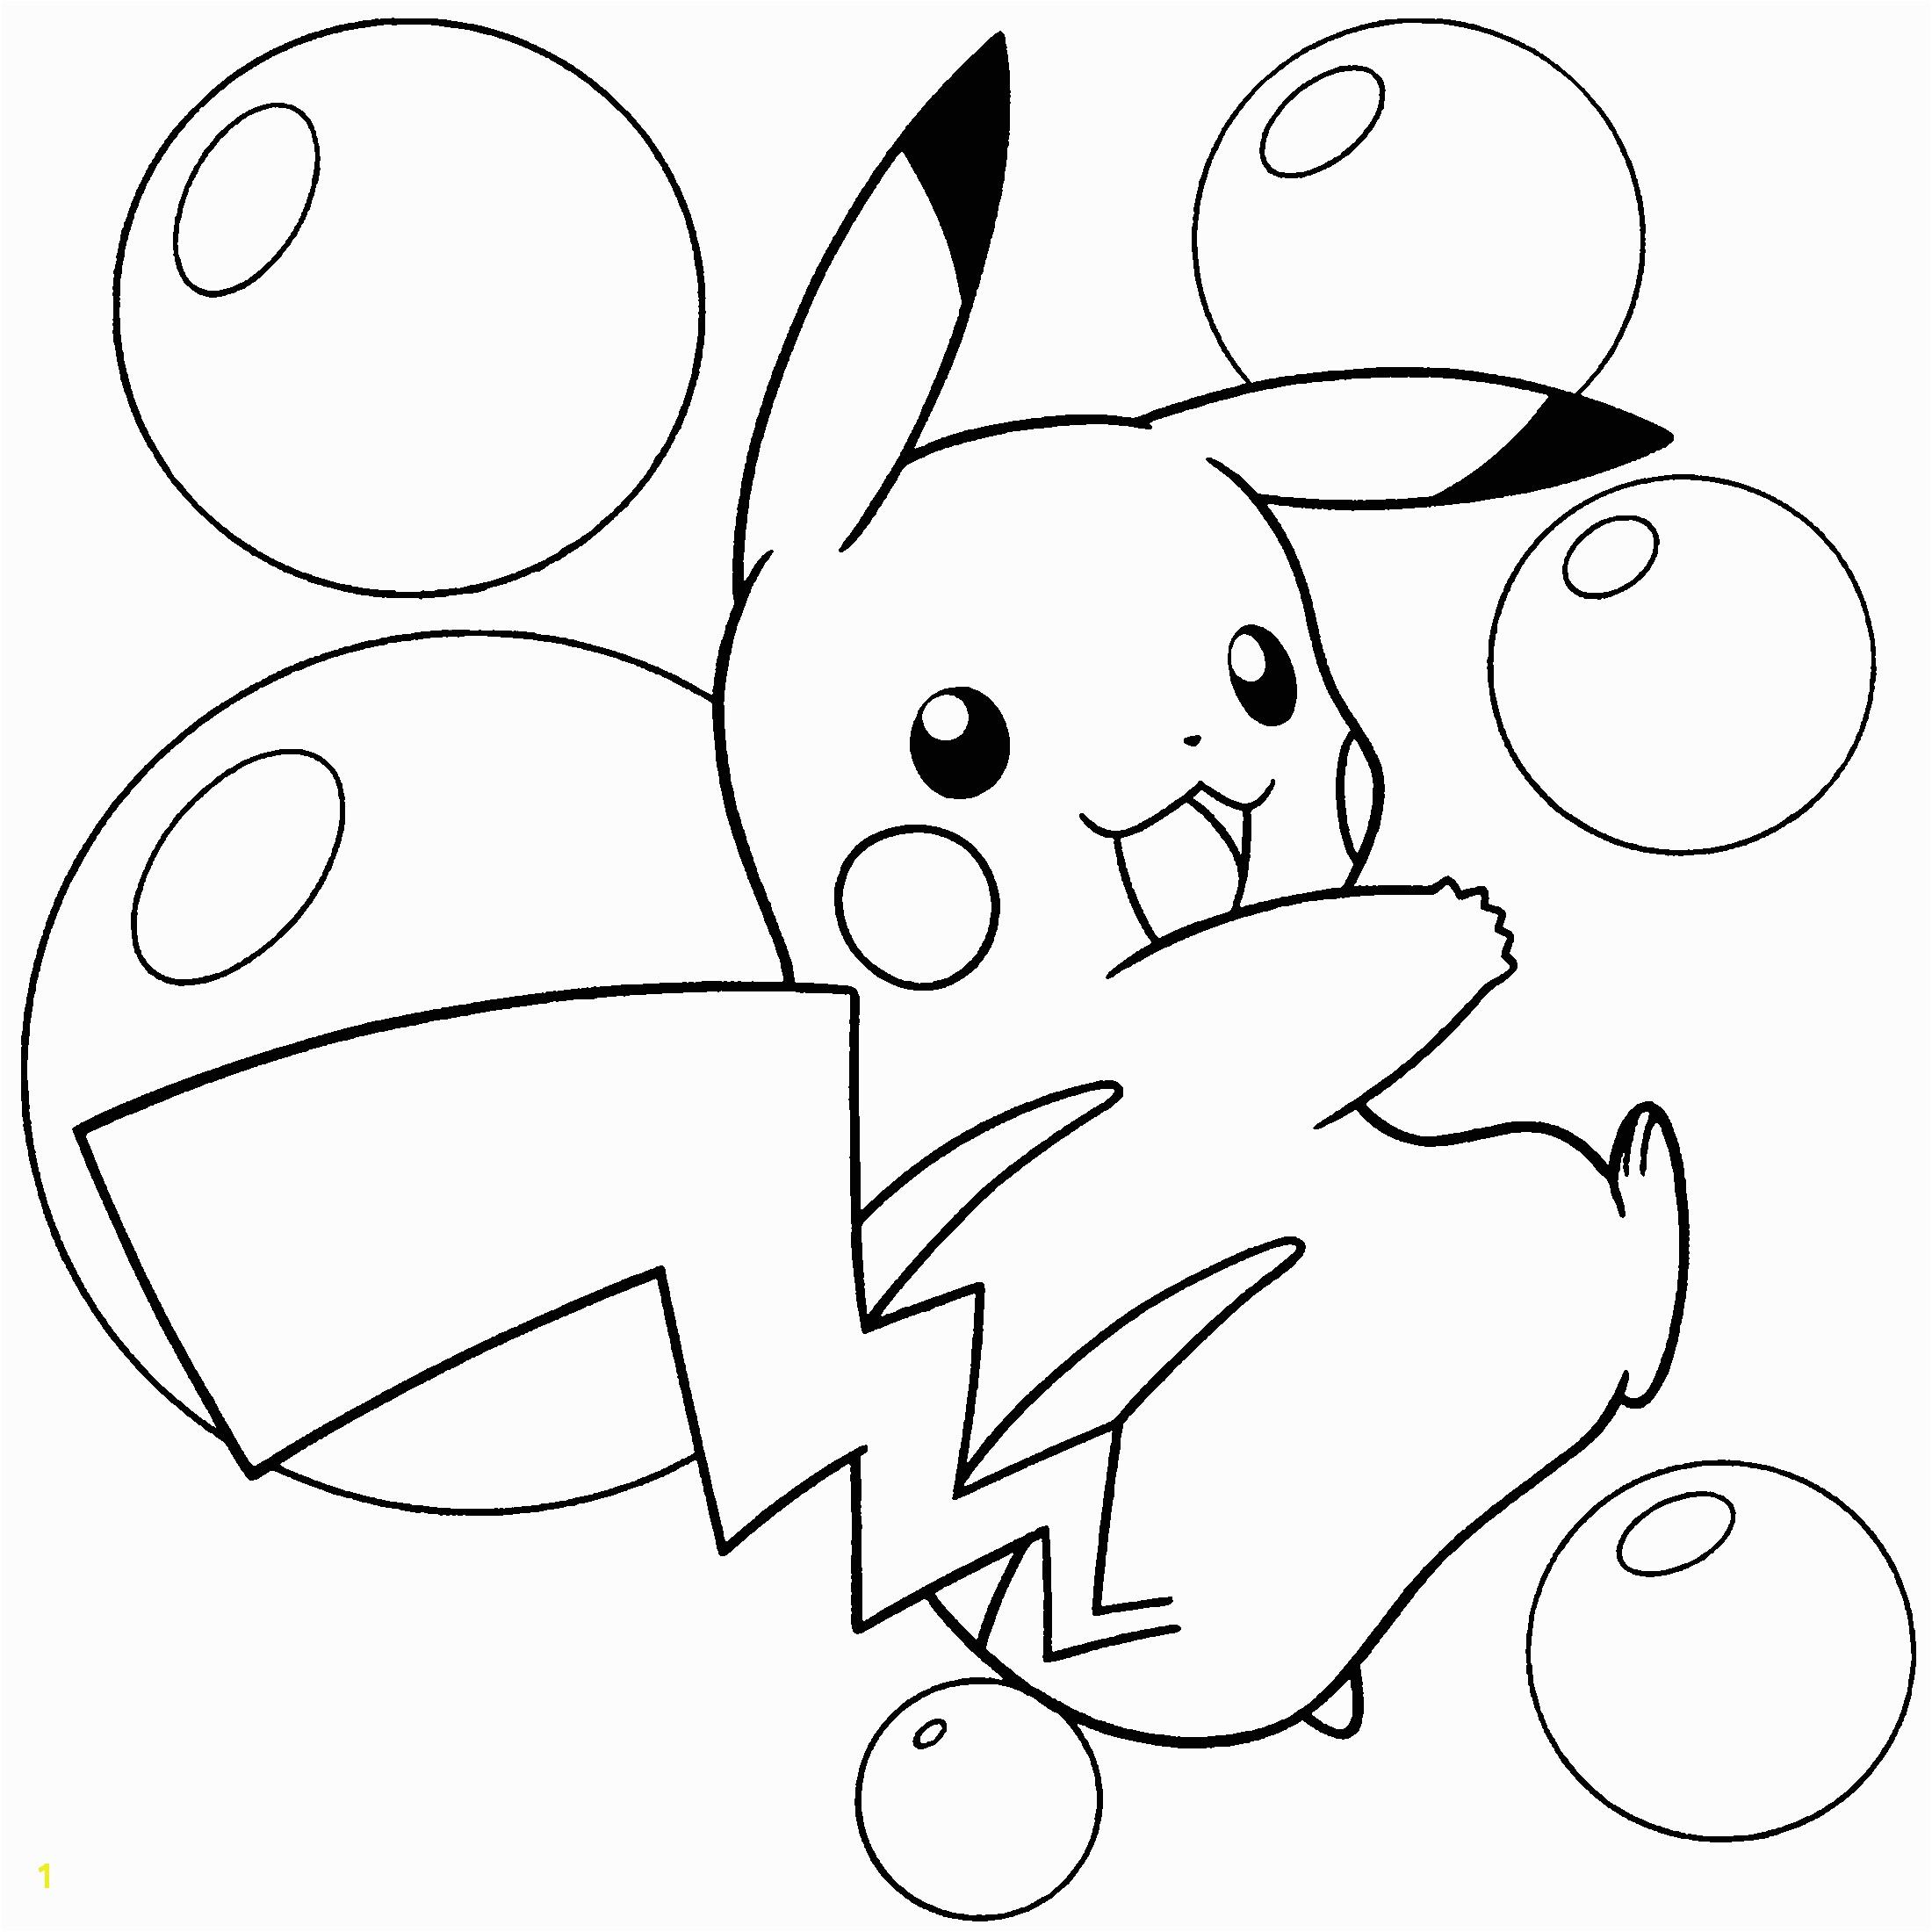 Kết quả h¬nh ảnh cho to mau pokemon